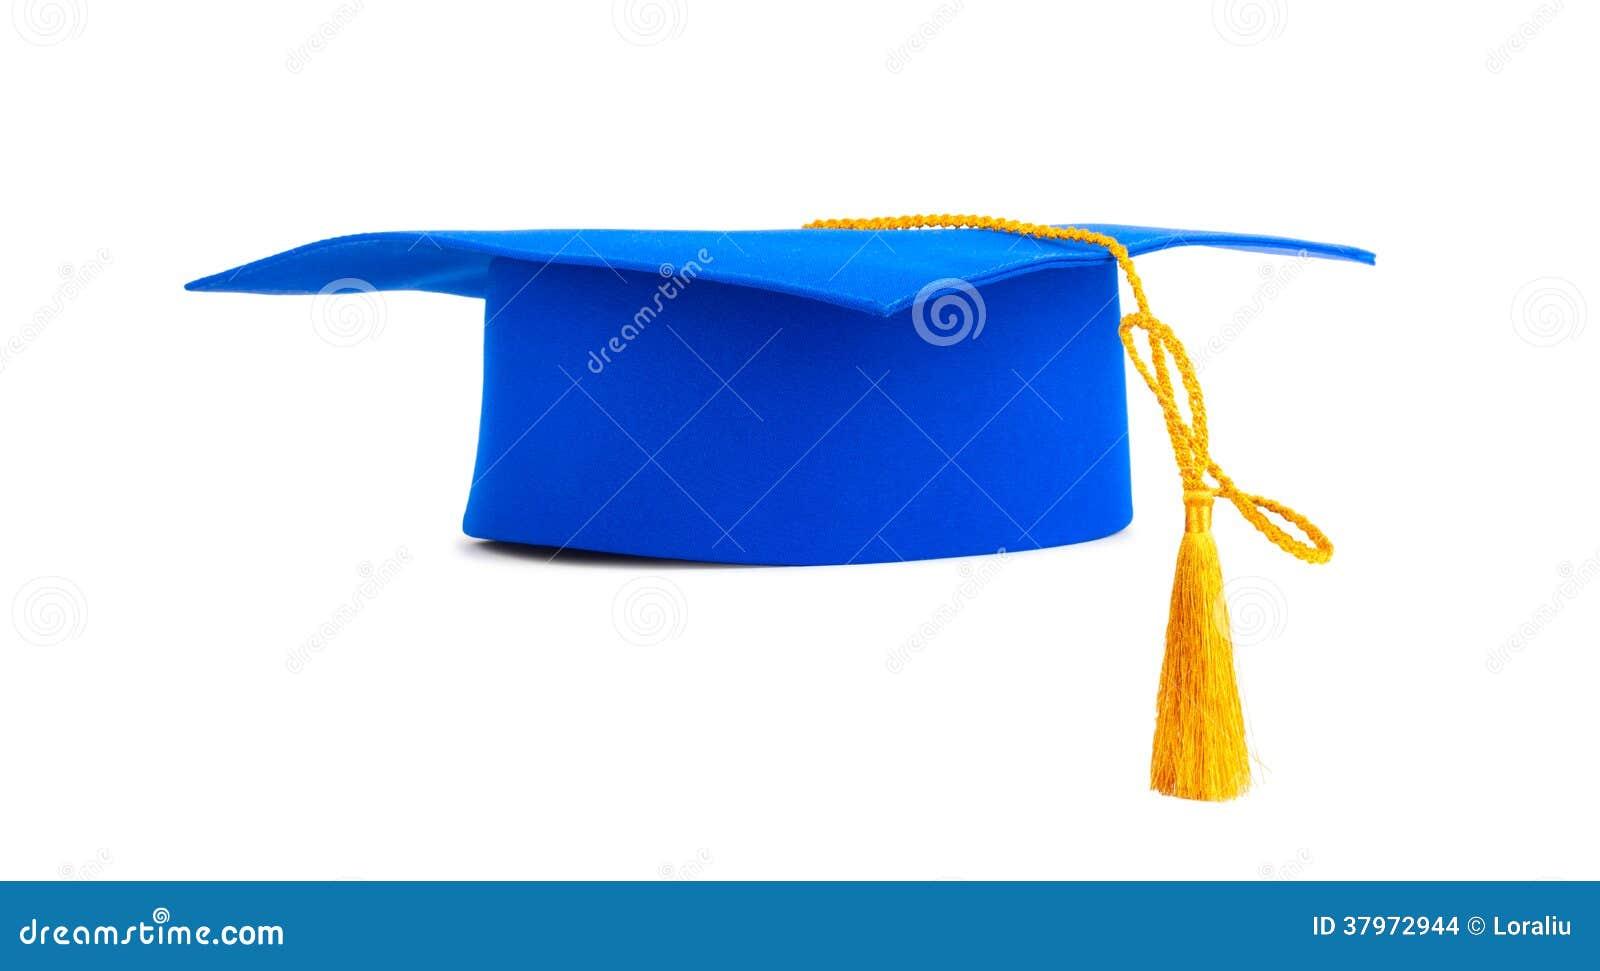 Blue Graduation Cap With Gold Tassel Stock Photo